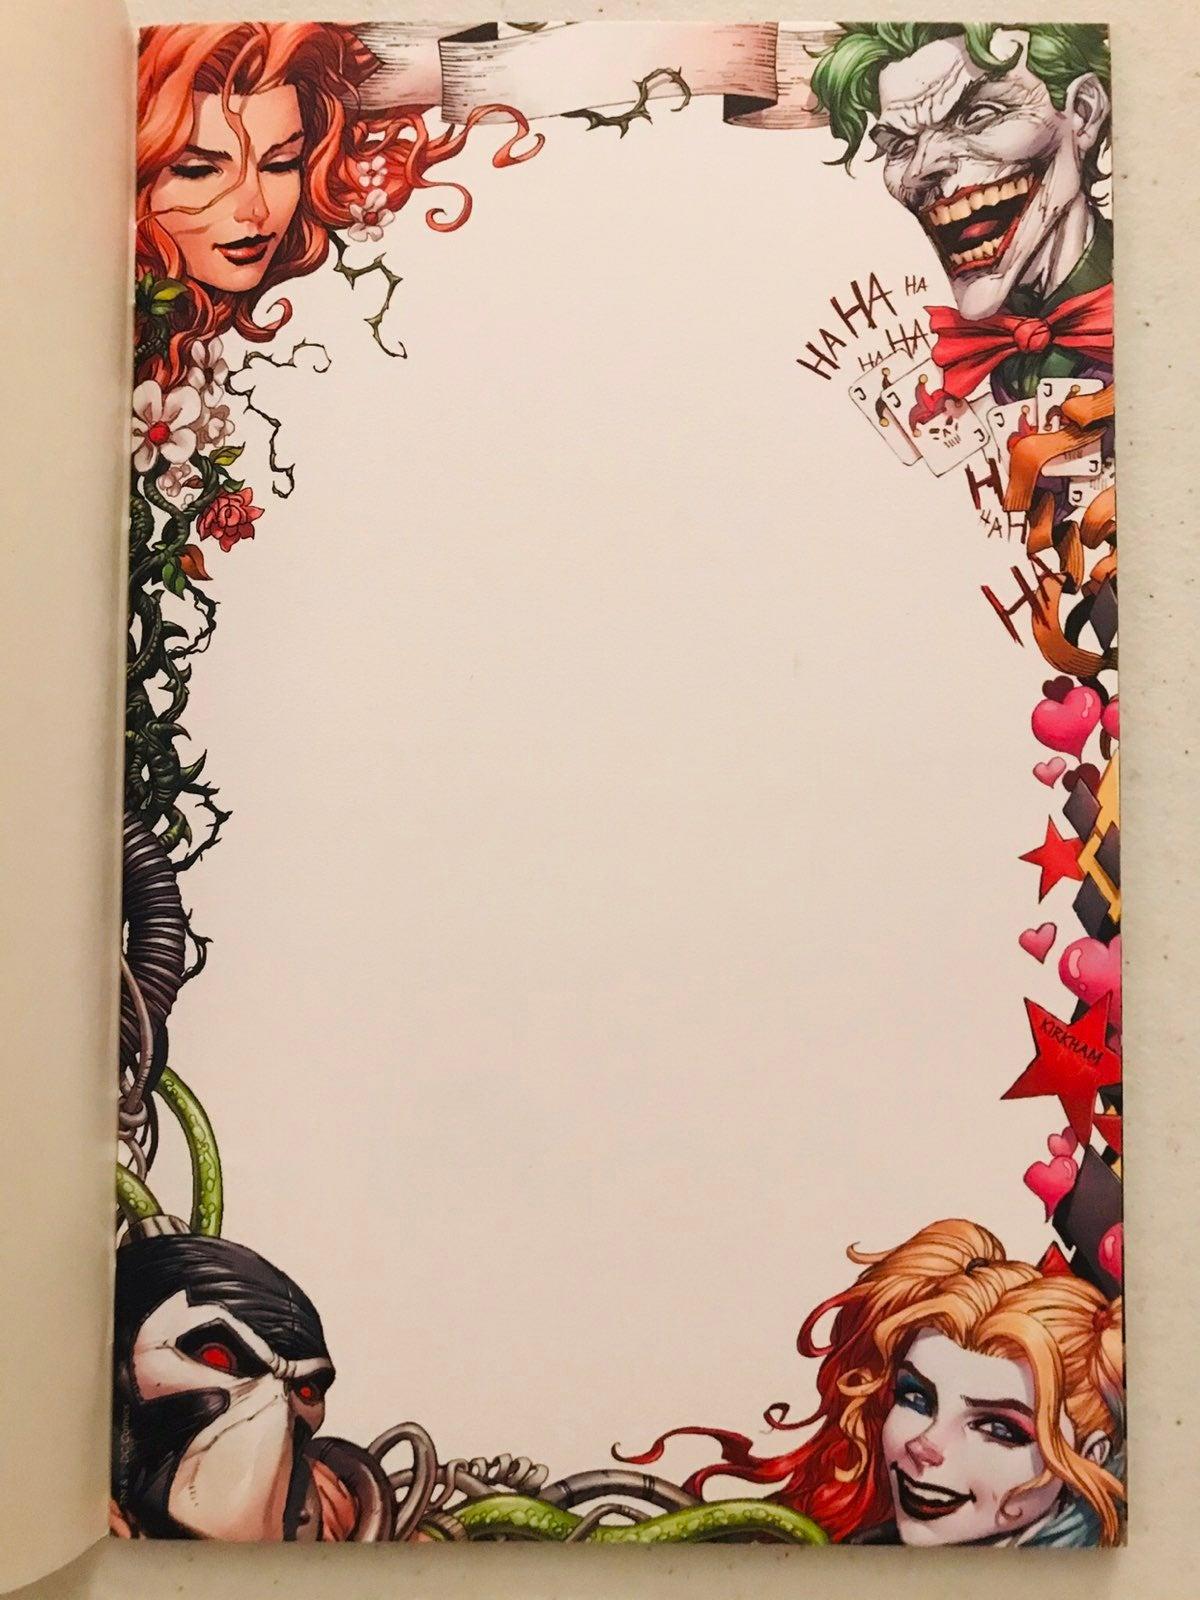 BATMAN #50 VIRGIN BLANK COVER Variant